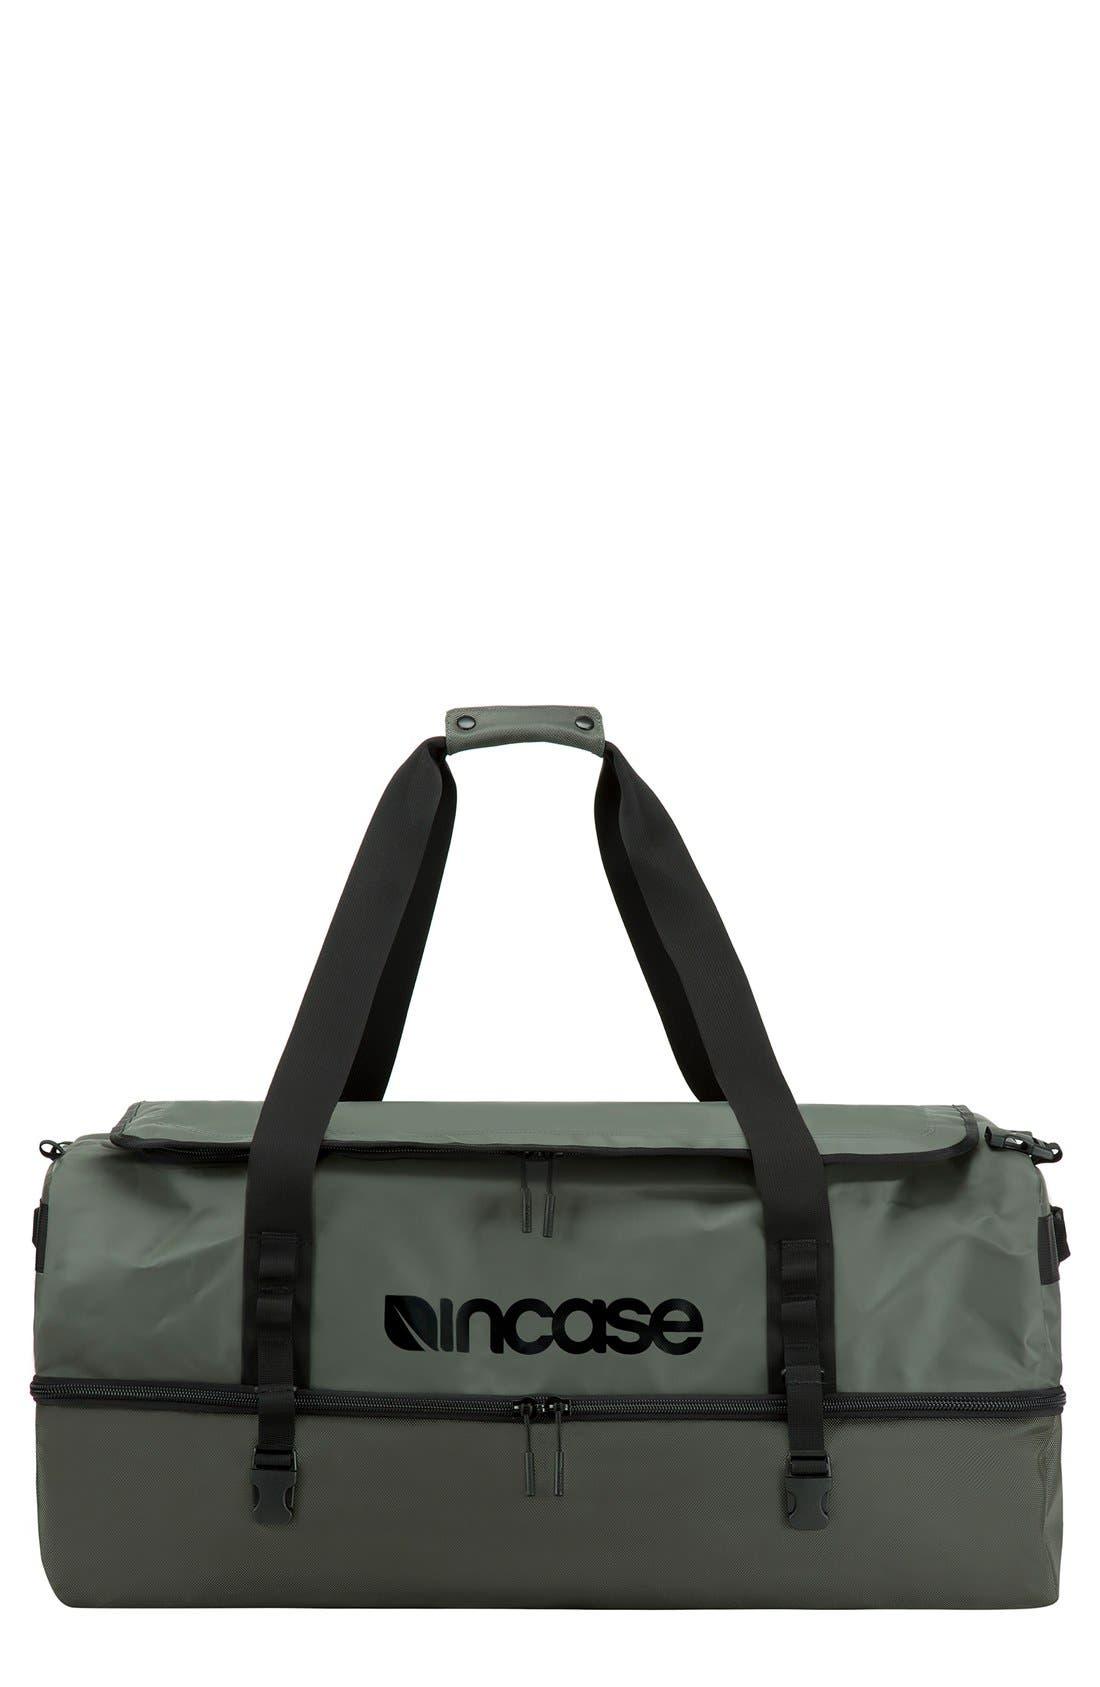 Incase Designs TRACTO Large Split Convertible Duffel Bag